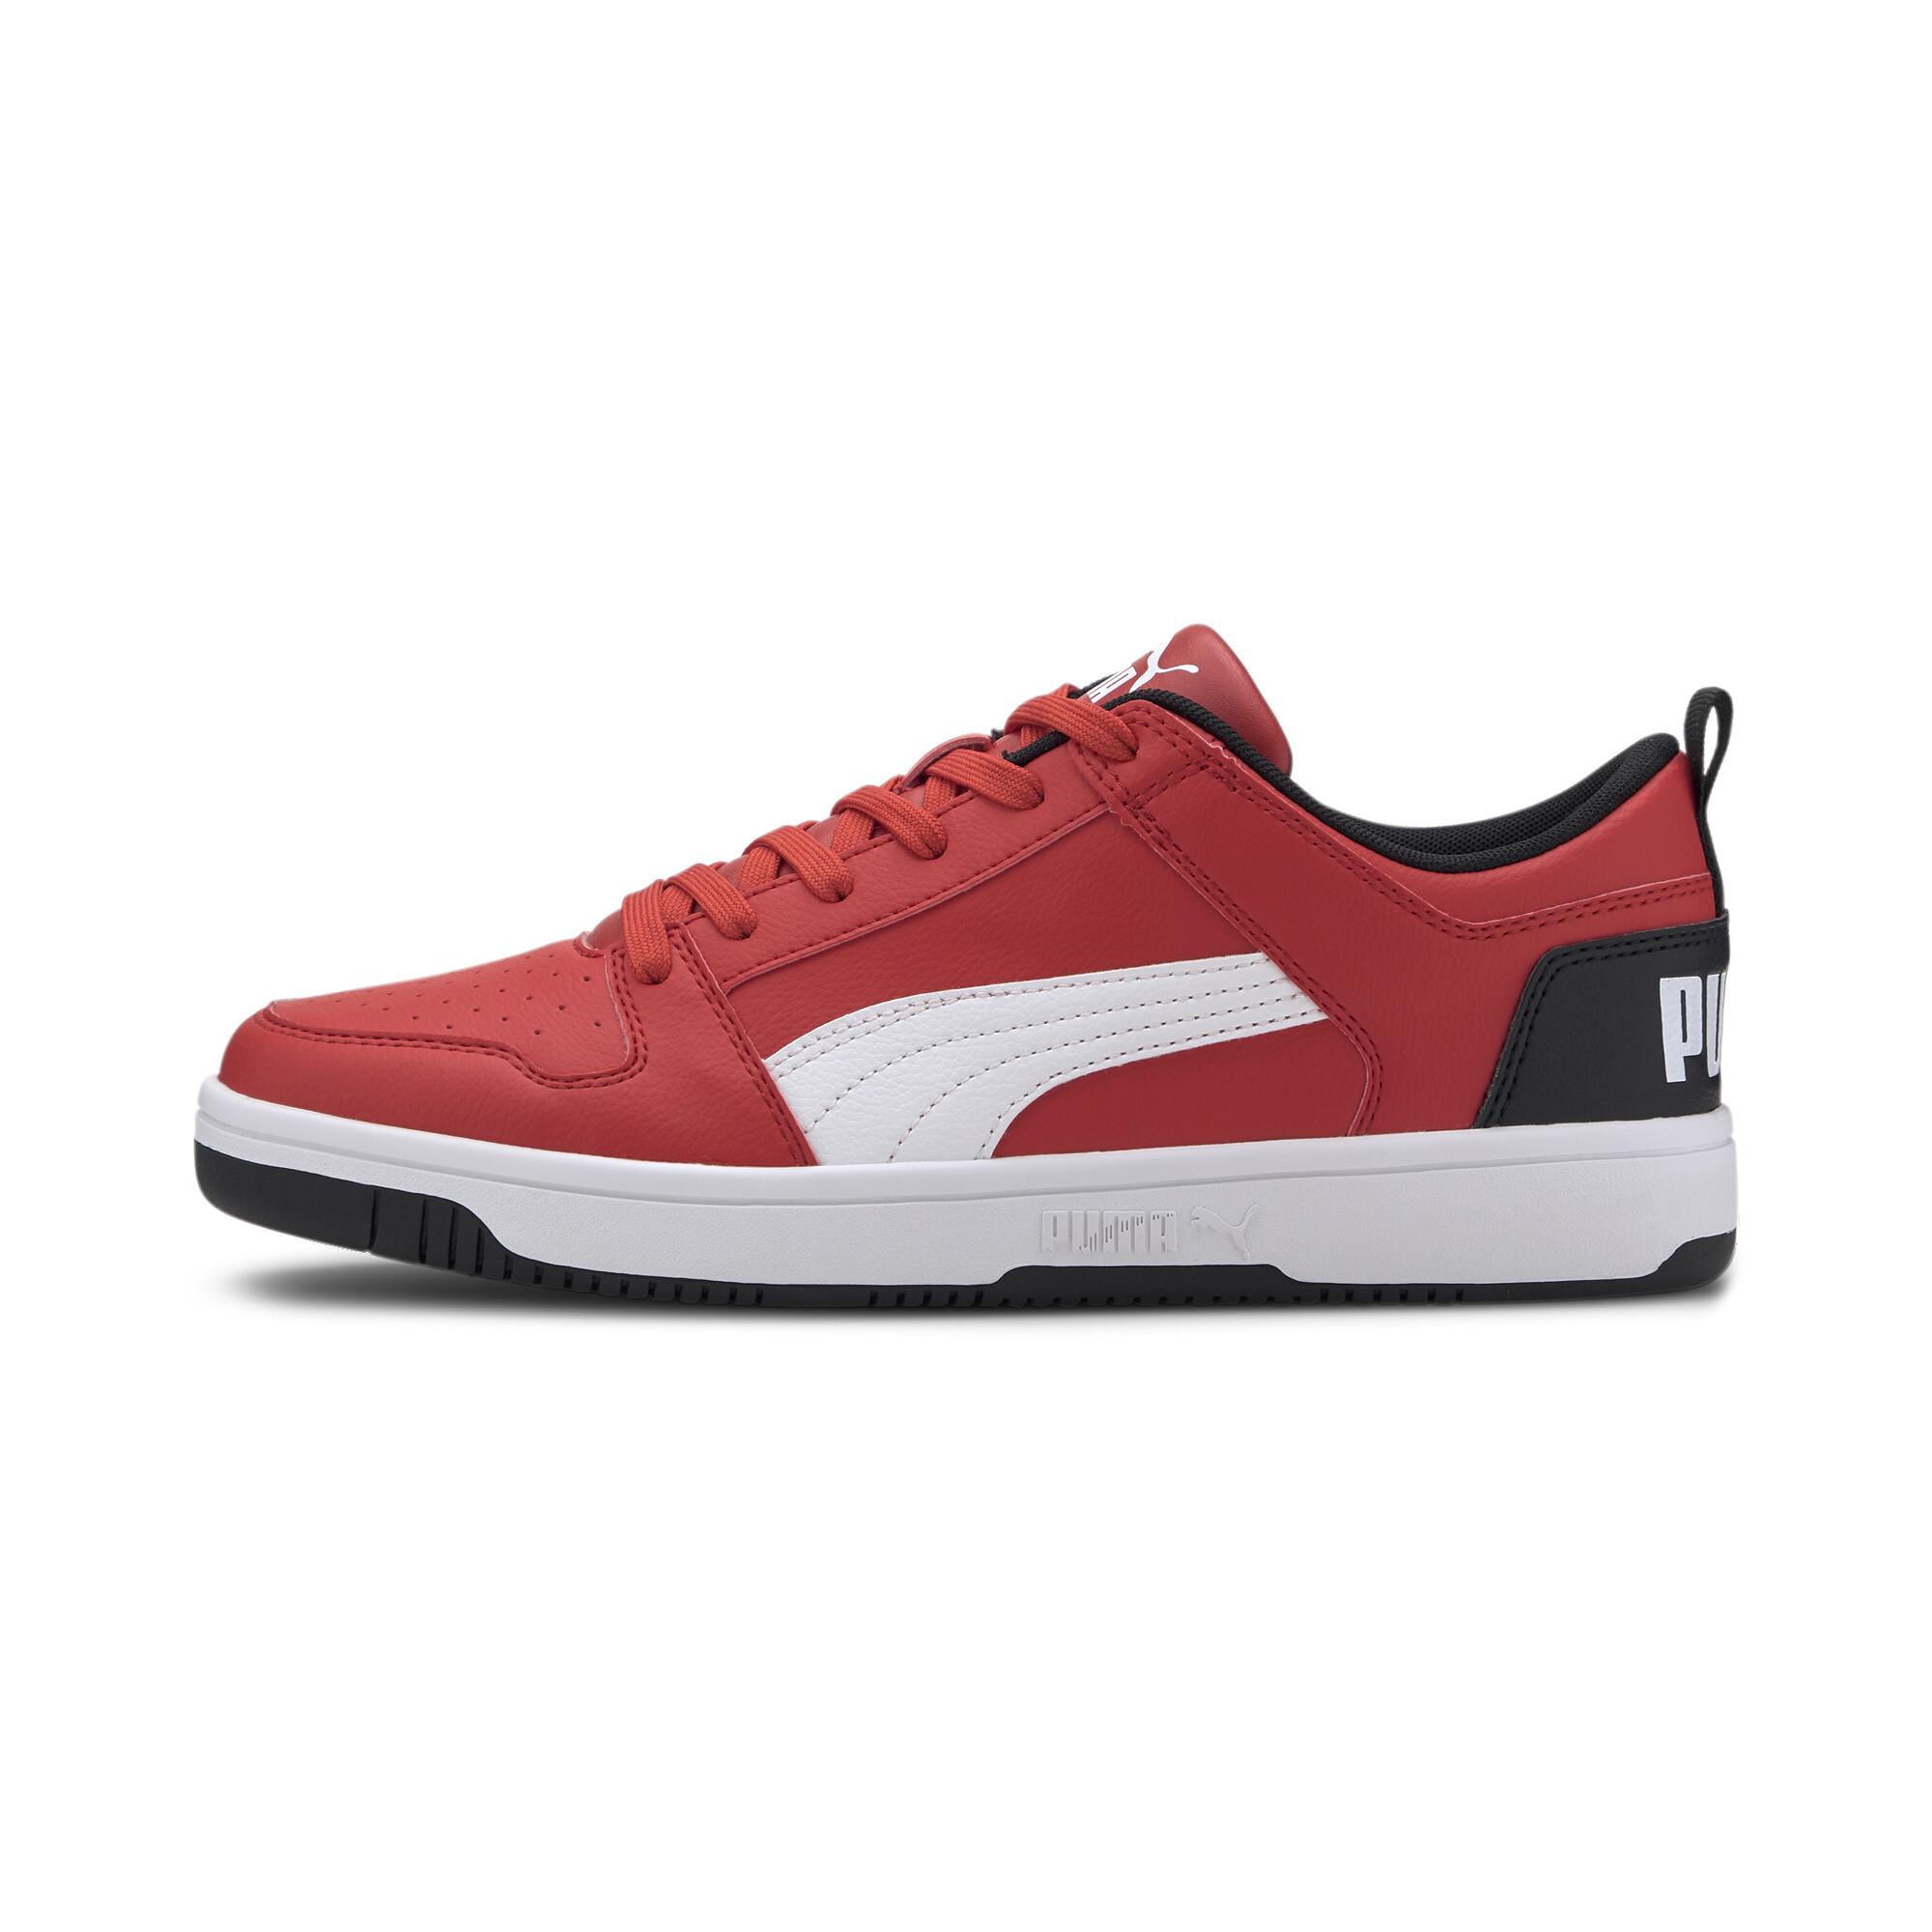 PUMA-PUMA-Rebound-LayUp-Lo-Men-039-s-Sneakers-Men-Shoe-Basics miniatura 18